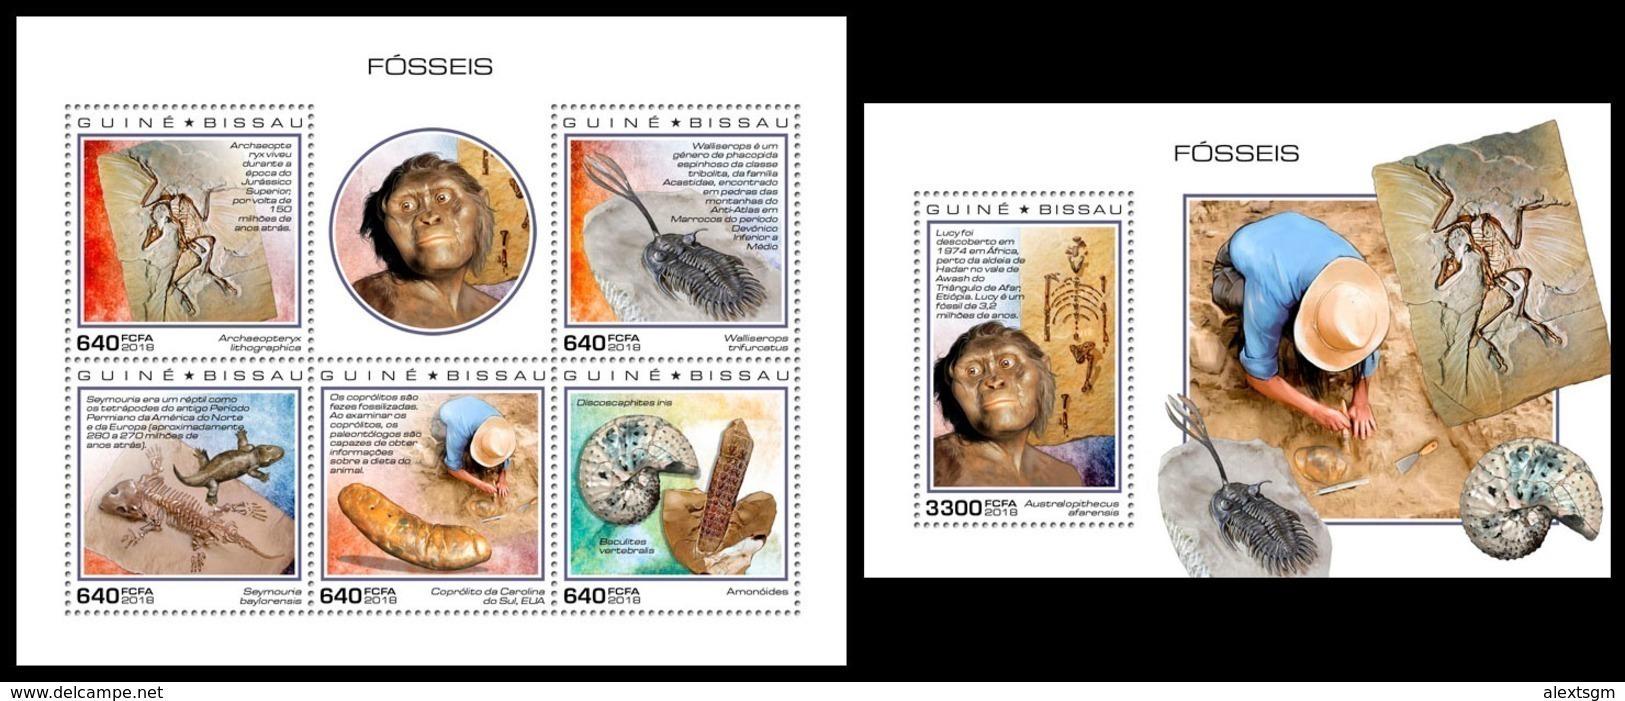 GUINEA BISSAU 2018 - Fossils. M/S + S/S. Official Issue - Prehistorisch